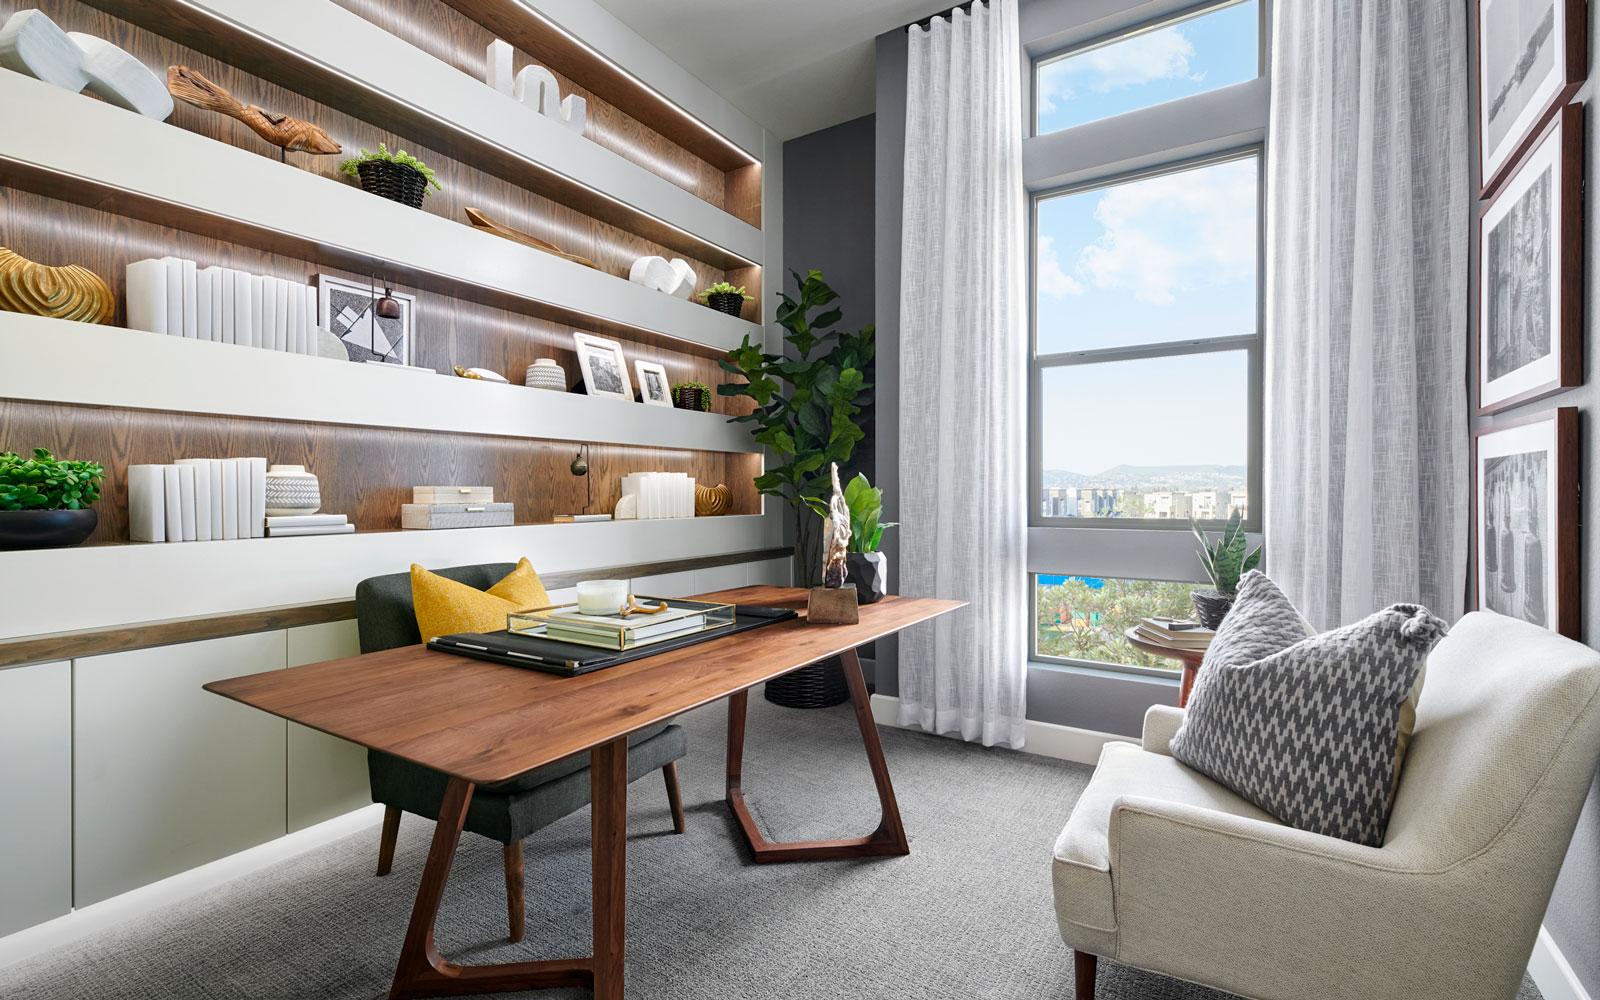 Bedroom 2 | Residence 2 | Hyde Park at Boulevard in Dublin, CA | Brookfield Residential